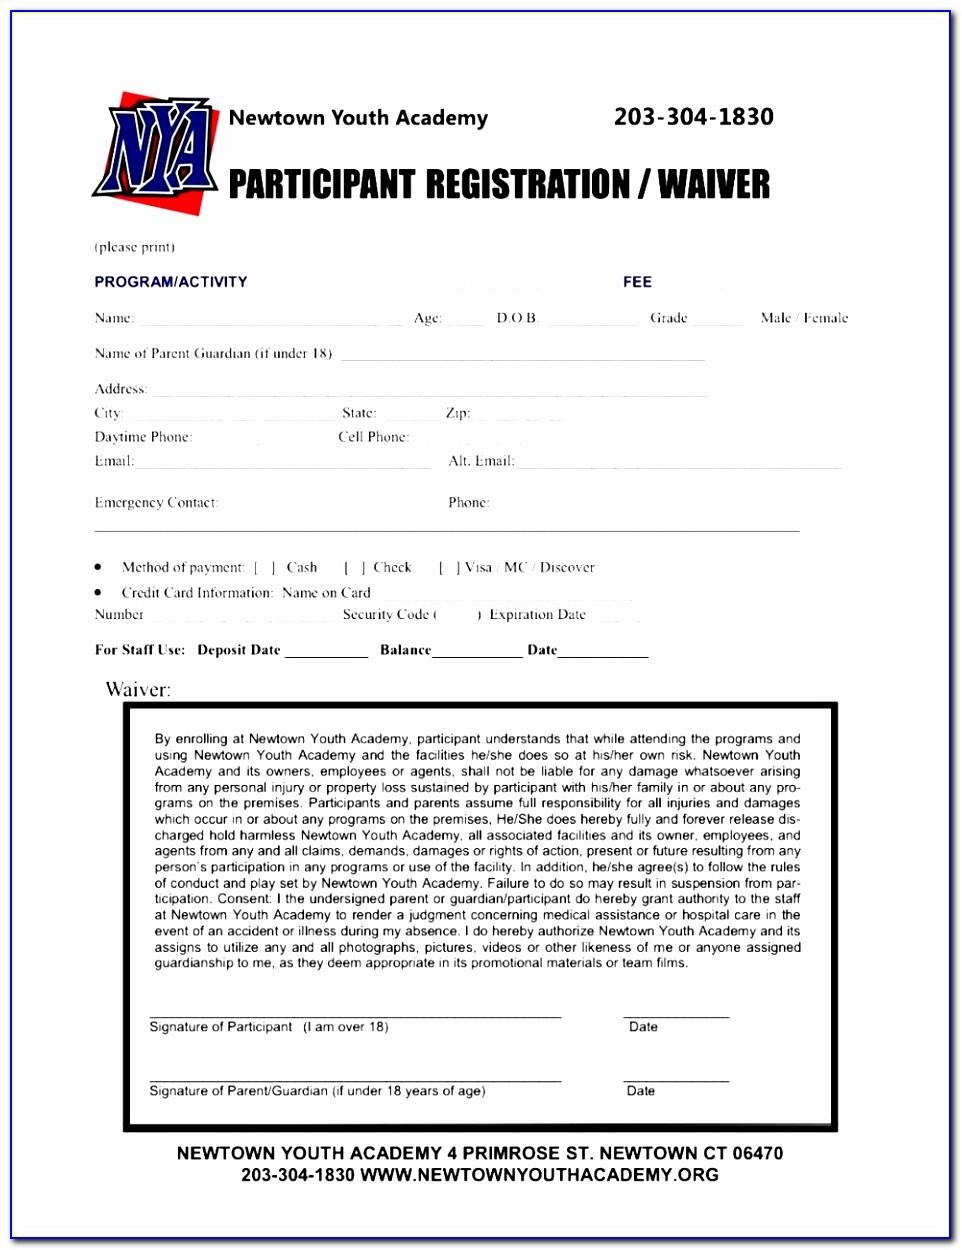 4 Baseball Registration Form Template Fabtemplatez Fabtemplatez Printable Baseball Registration Form Template Unique Pdf Word Excel Templates Ouatj